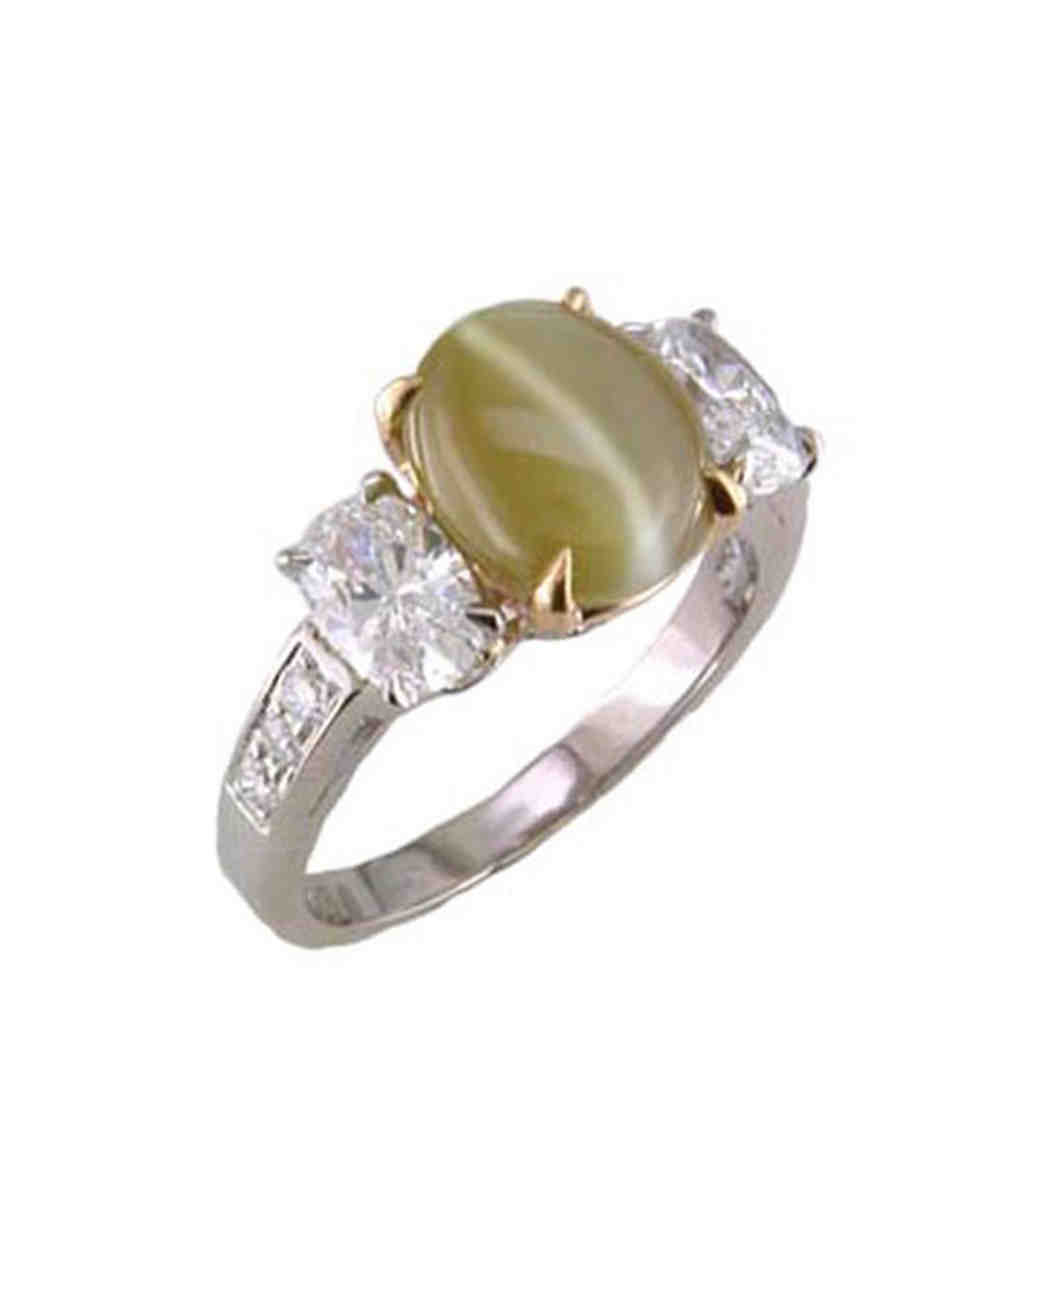 heyman_ohb_301369_gold_plat_catseye_dia_ring.jpg